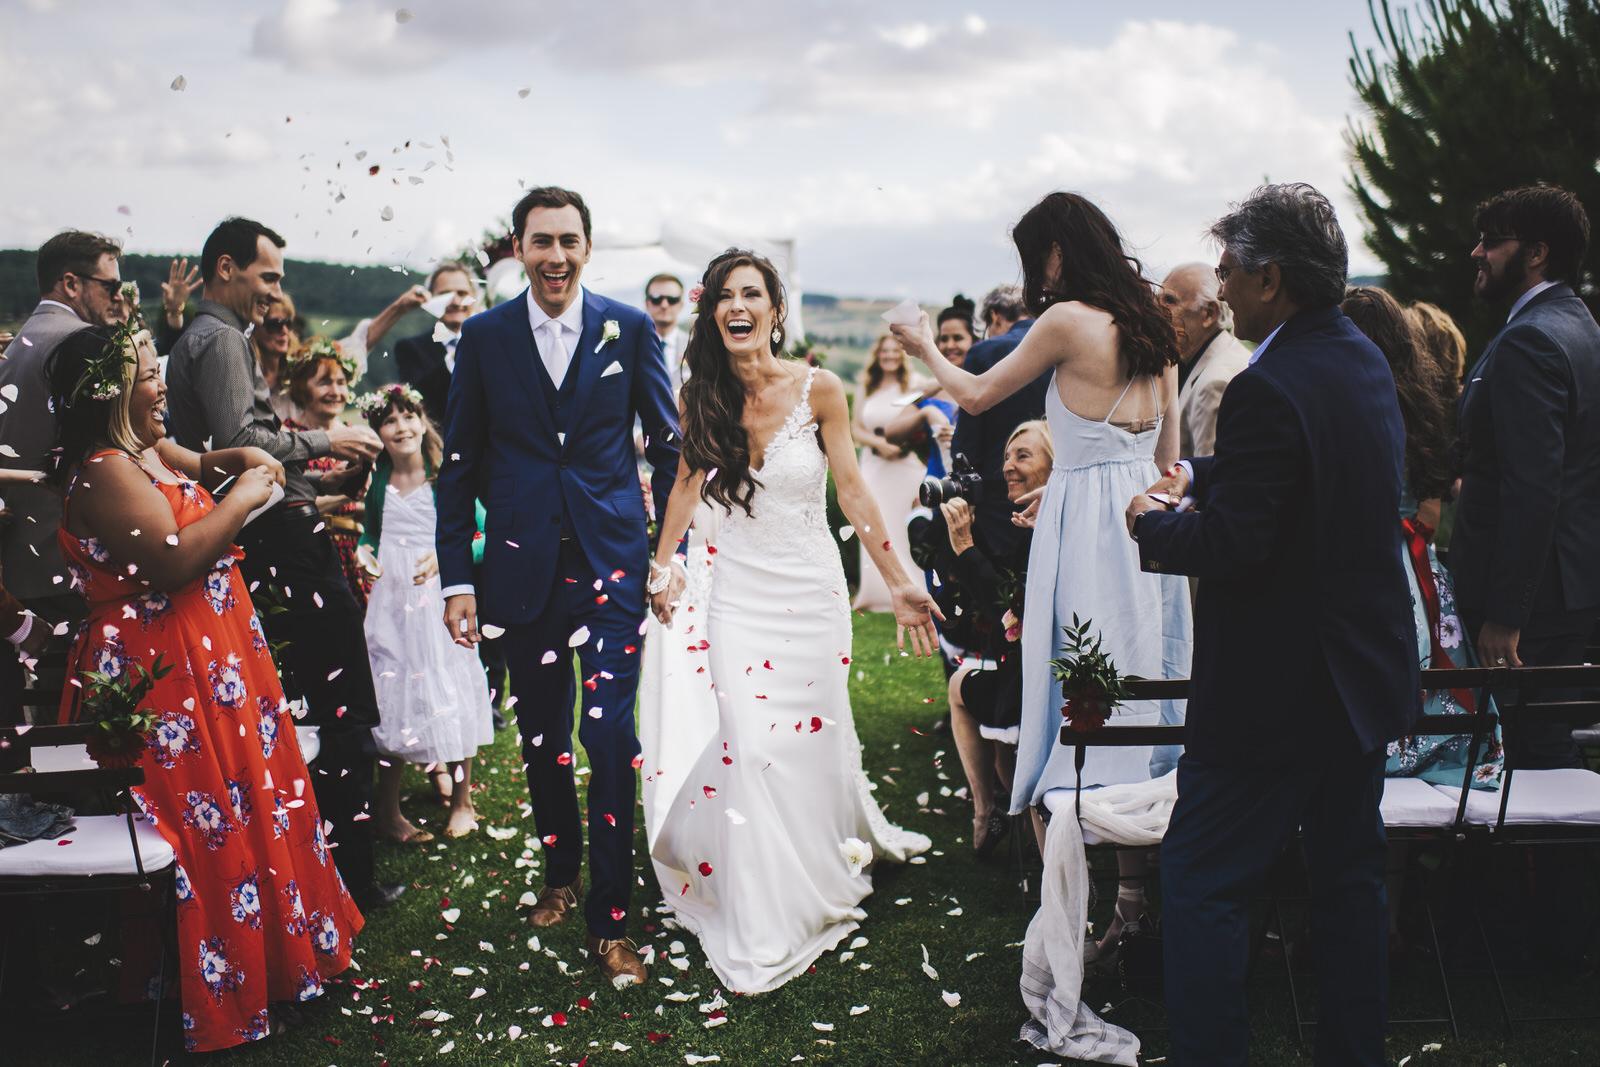 wedding photographer in italy-venice-tuscany-florence-amalfi coast-como lake-villa del balbianello-siena-amalfi-ravello-belmond-villa cimbrone41